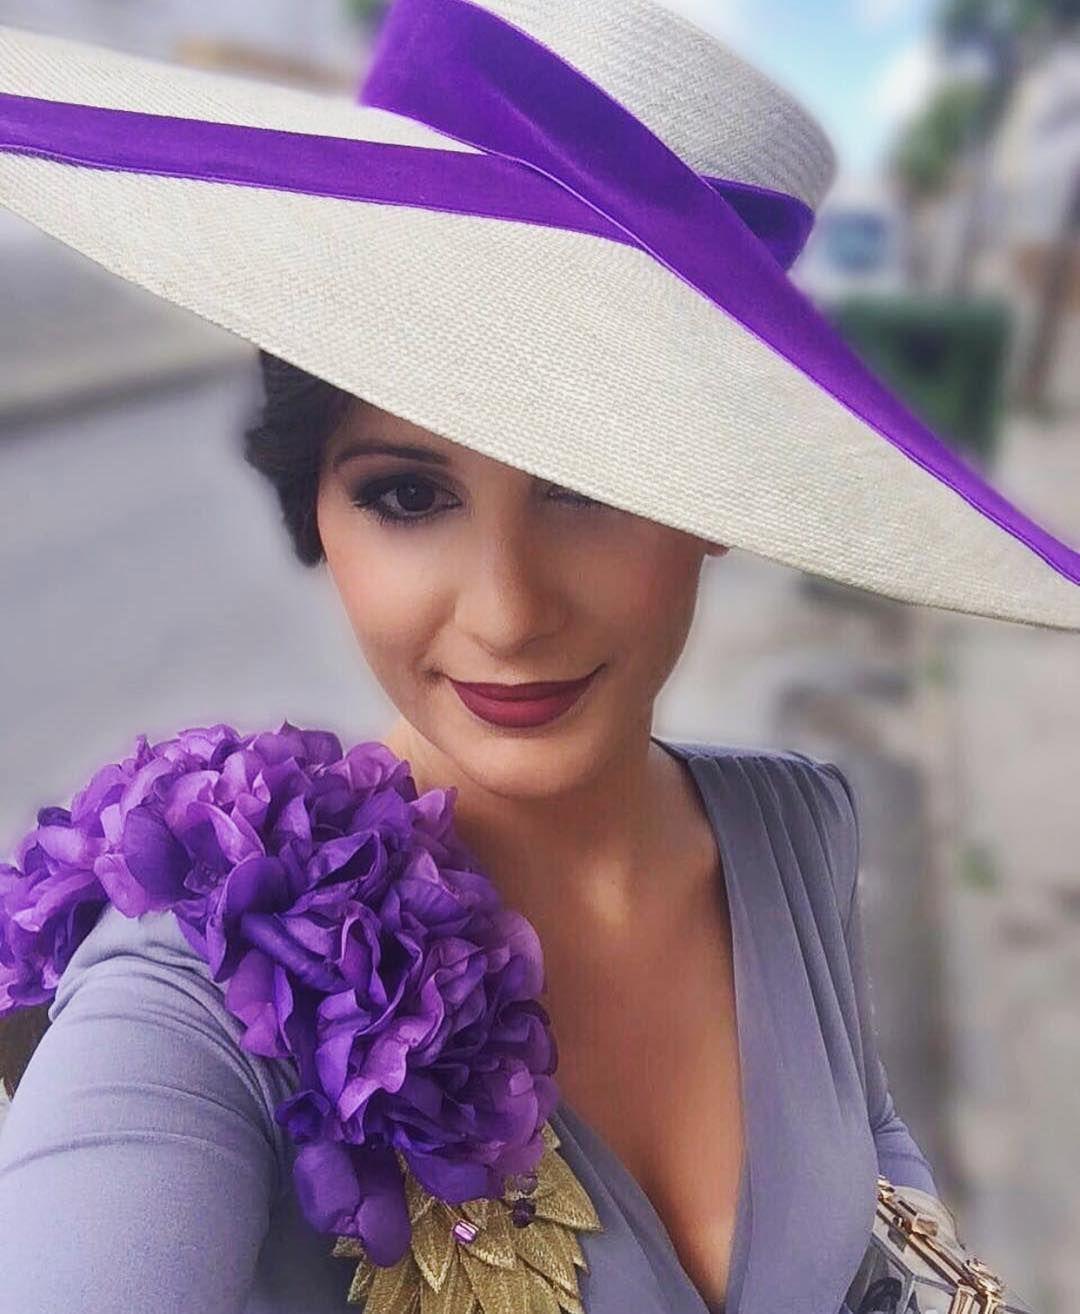 Wonder Lila Invitadas con estilo | moda | Pinterest | Lilas, Con ...